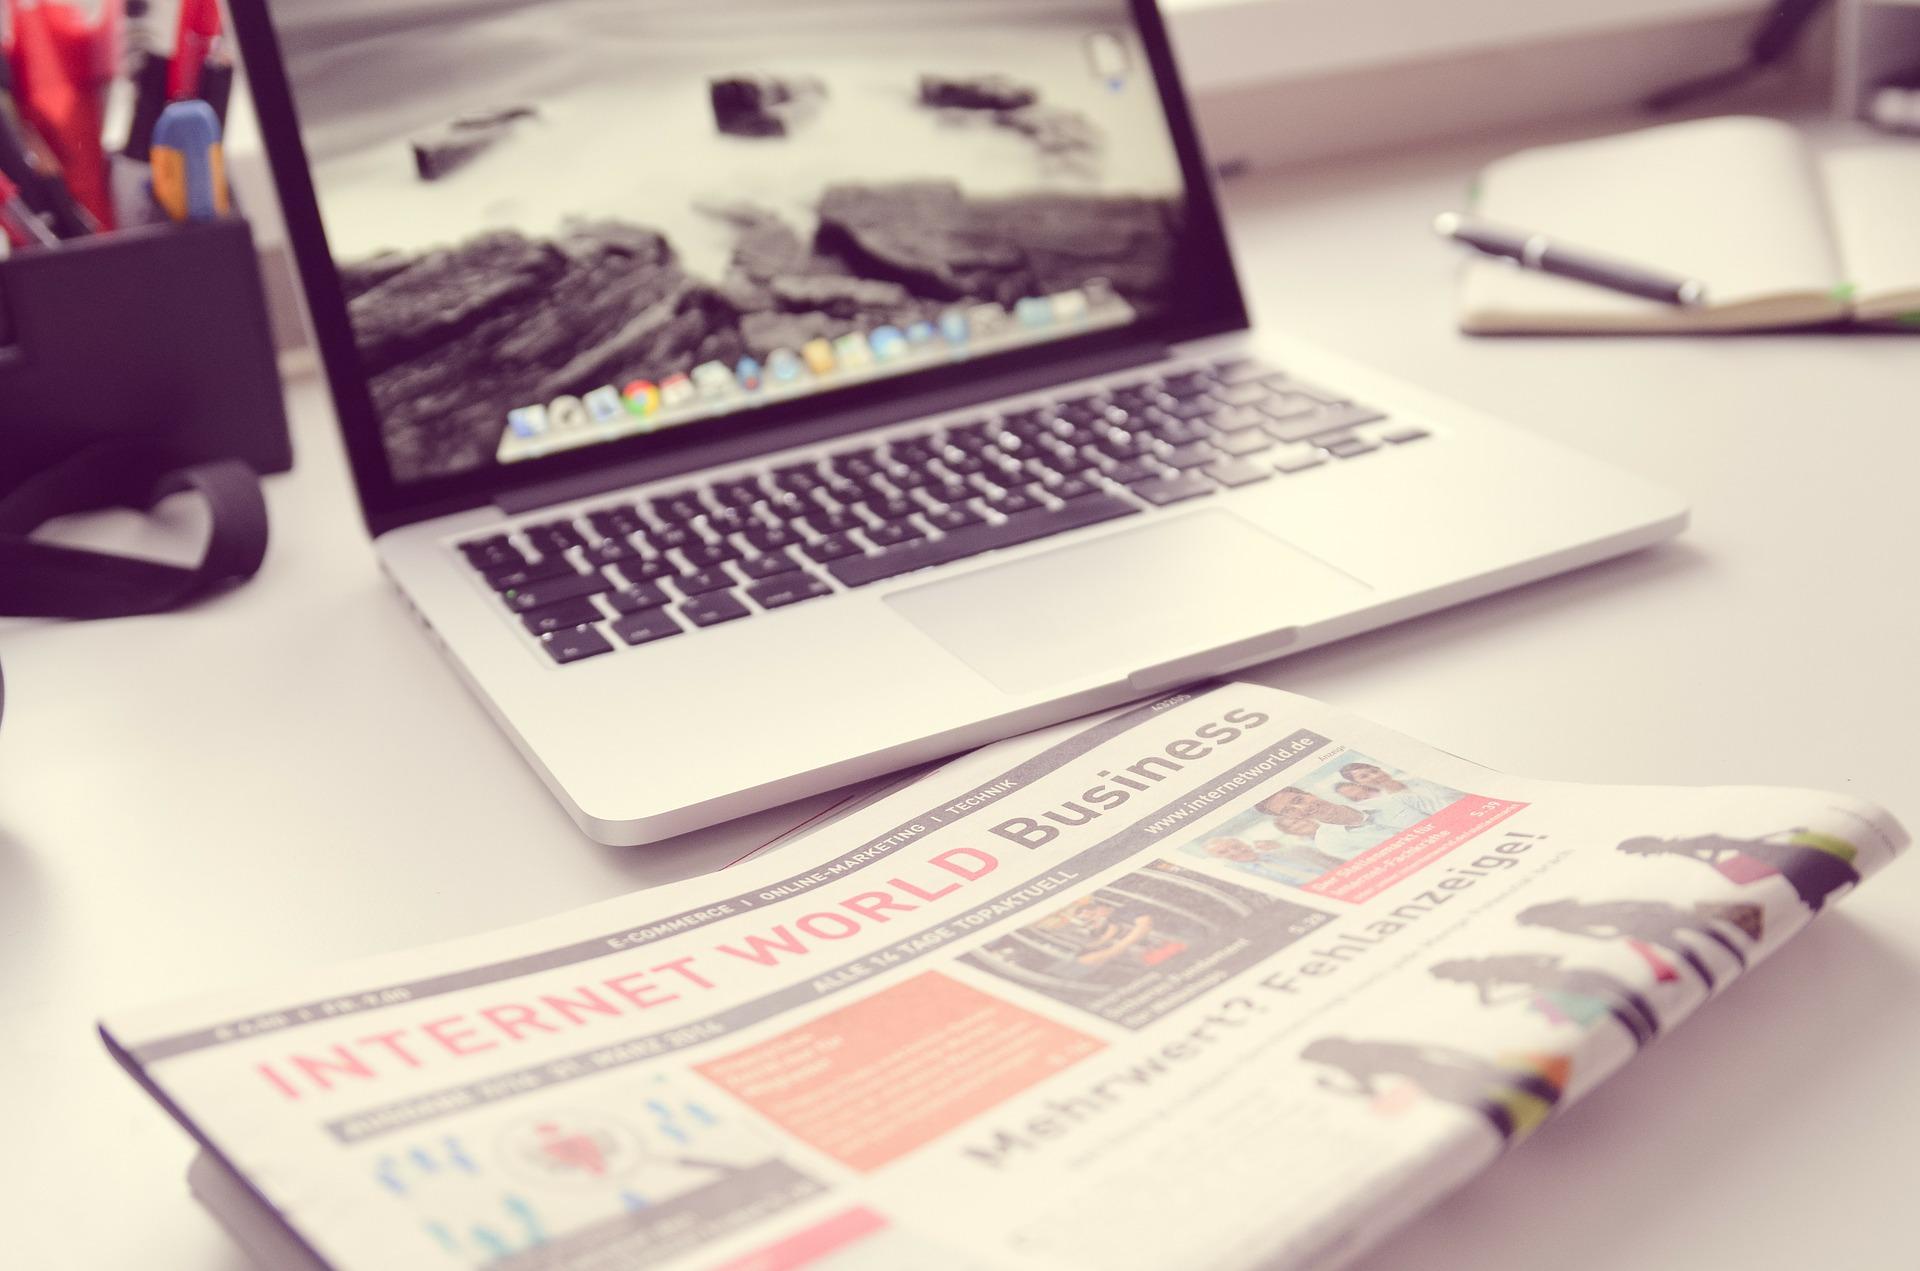 Zeitungsverlag, Social Media